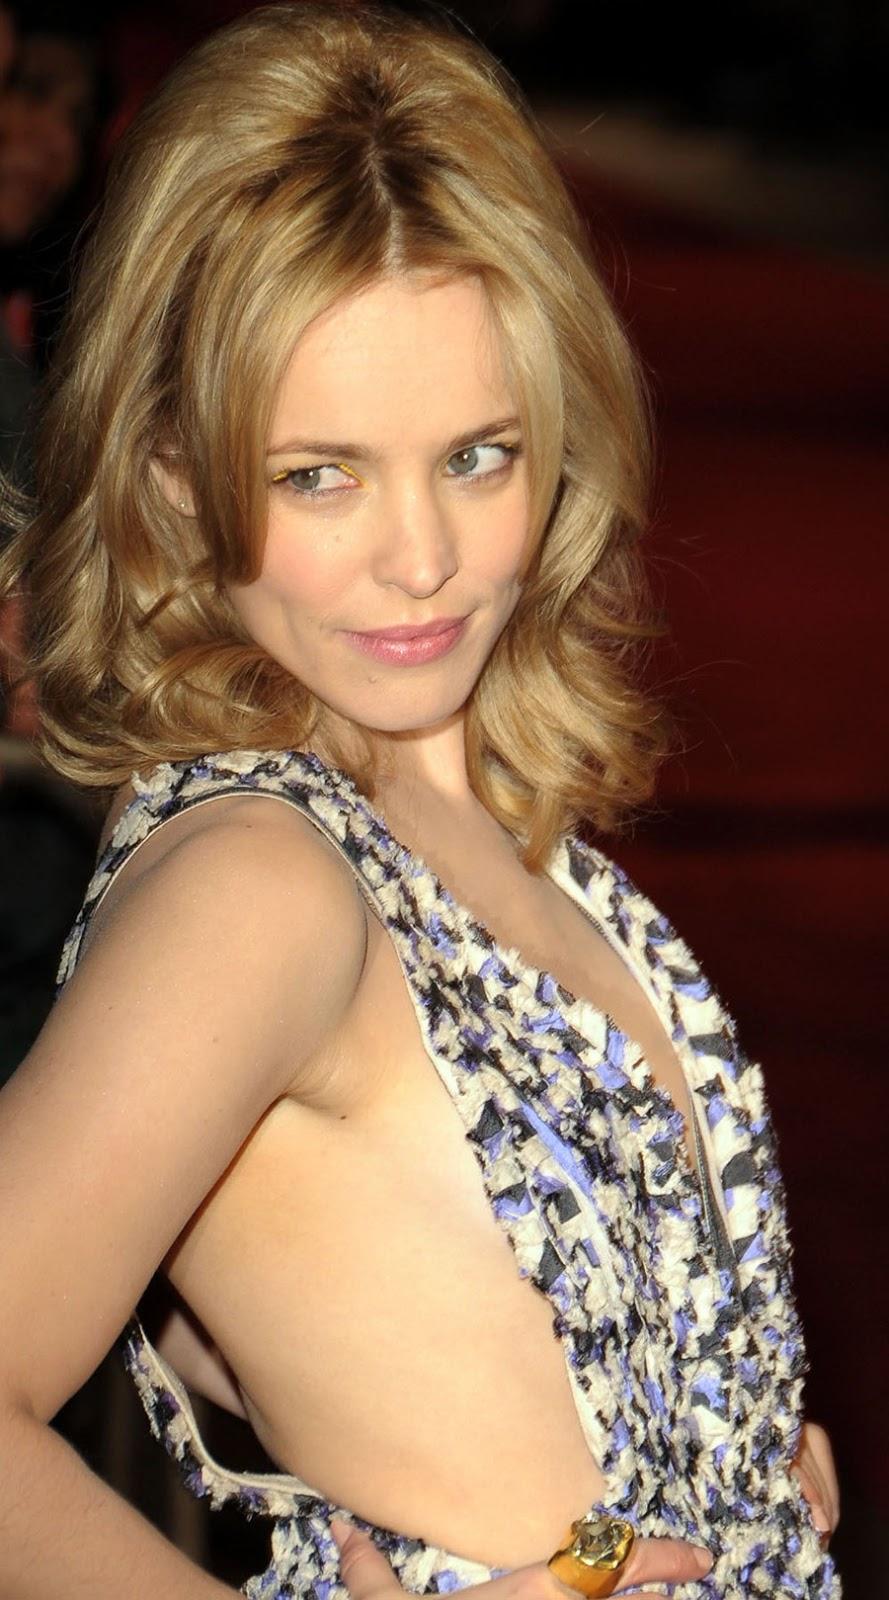 Rachel McAdams: Rachel McAdams breast pics Rachel Mcadams